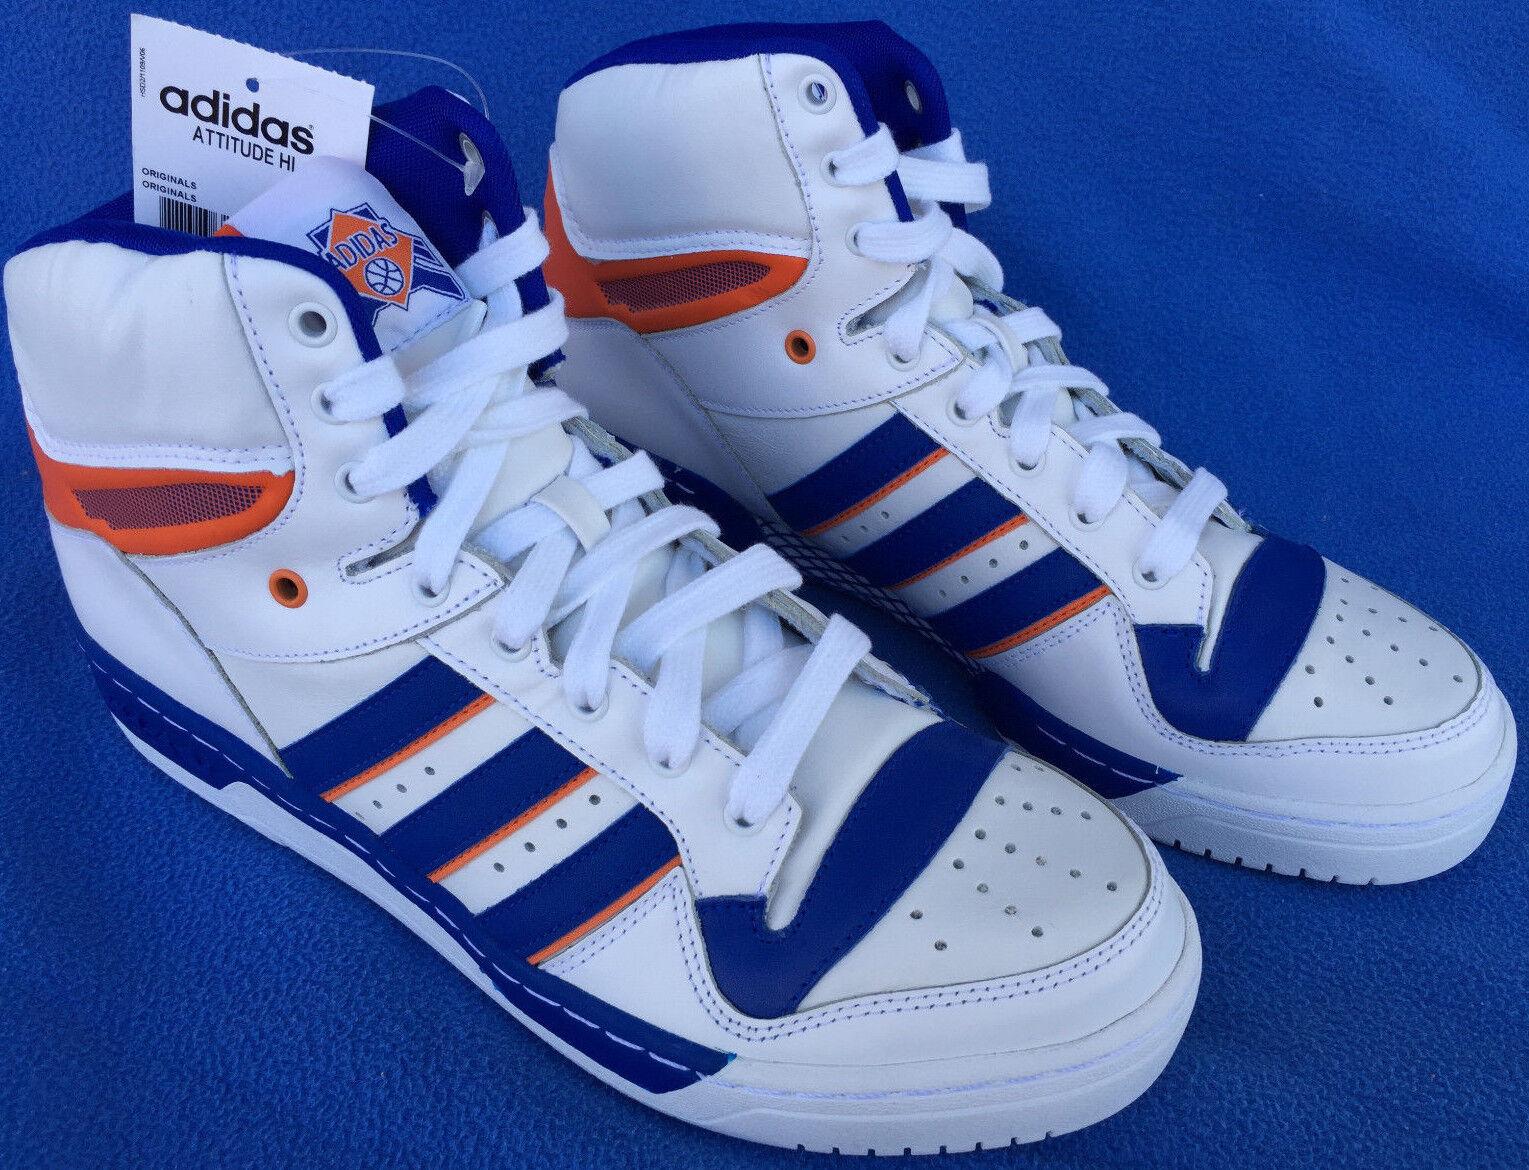 quality design dda70 d9878 new Adidas Attitude HI NY Knicks D73897 Retro Ewing Basketball Shoes Men s  9 NBA durable service